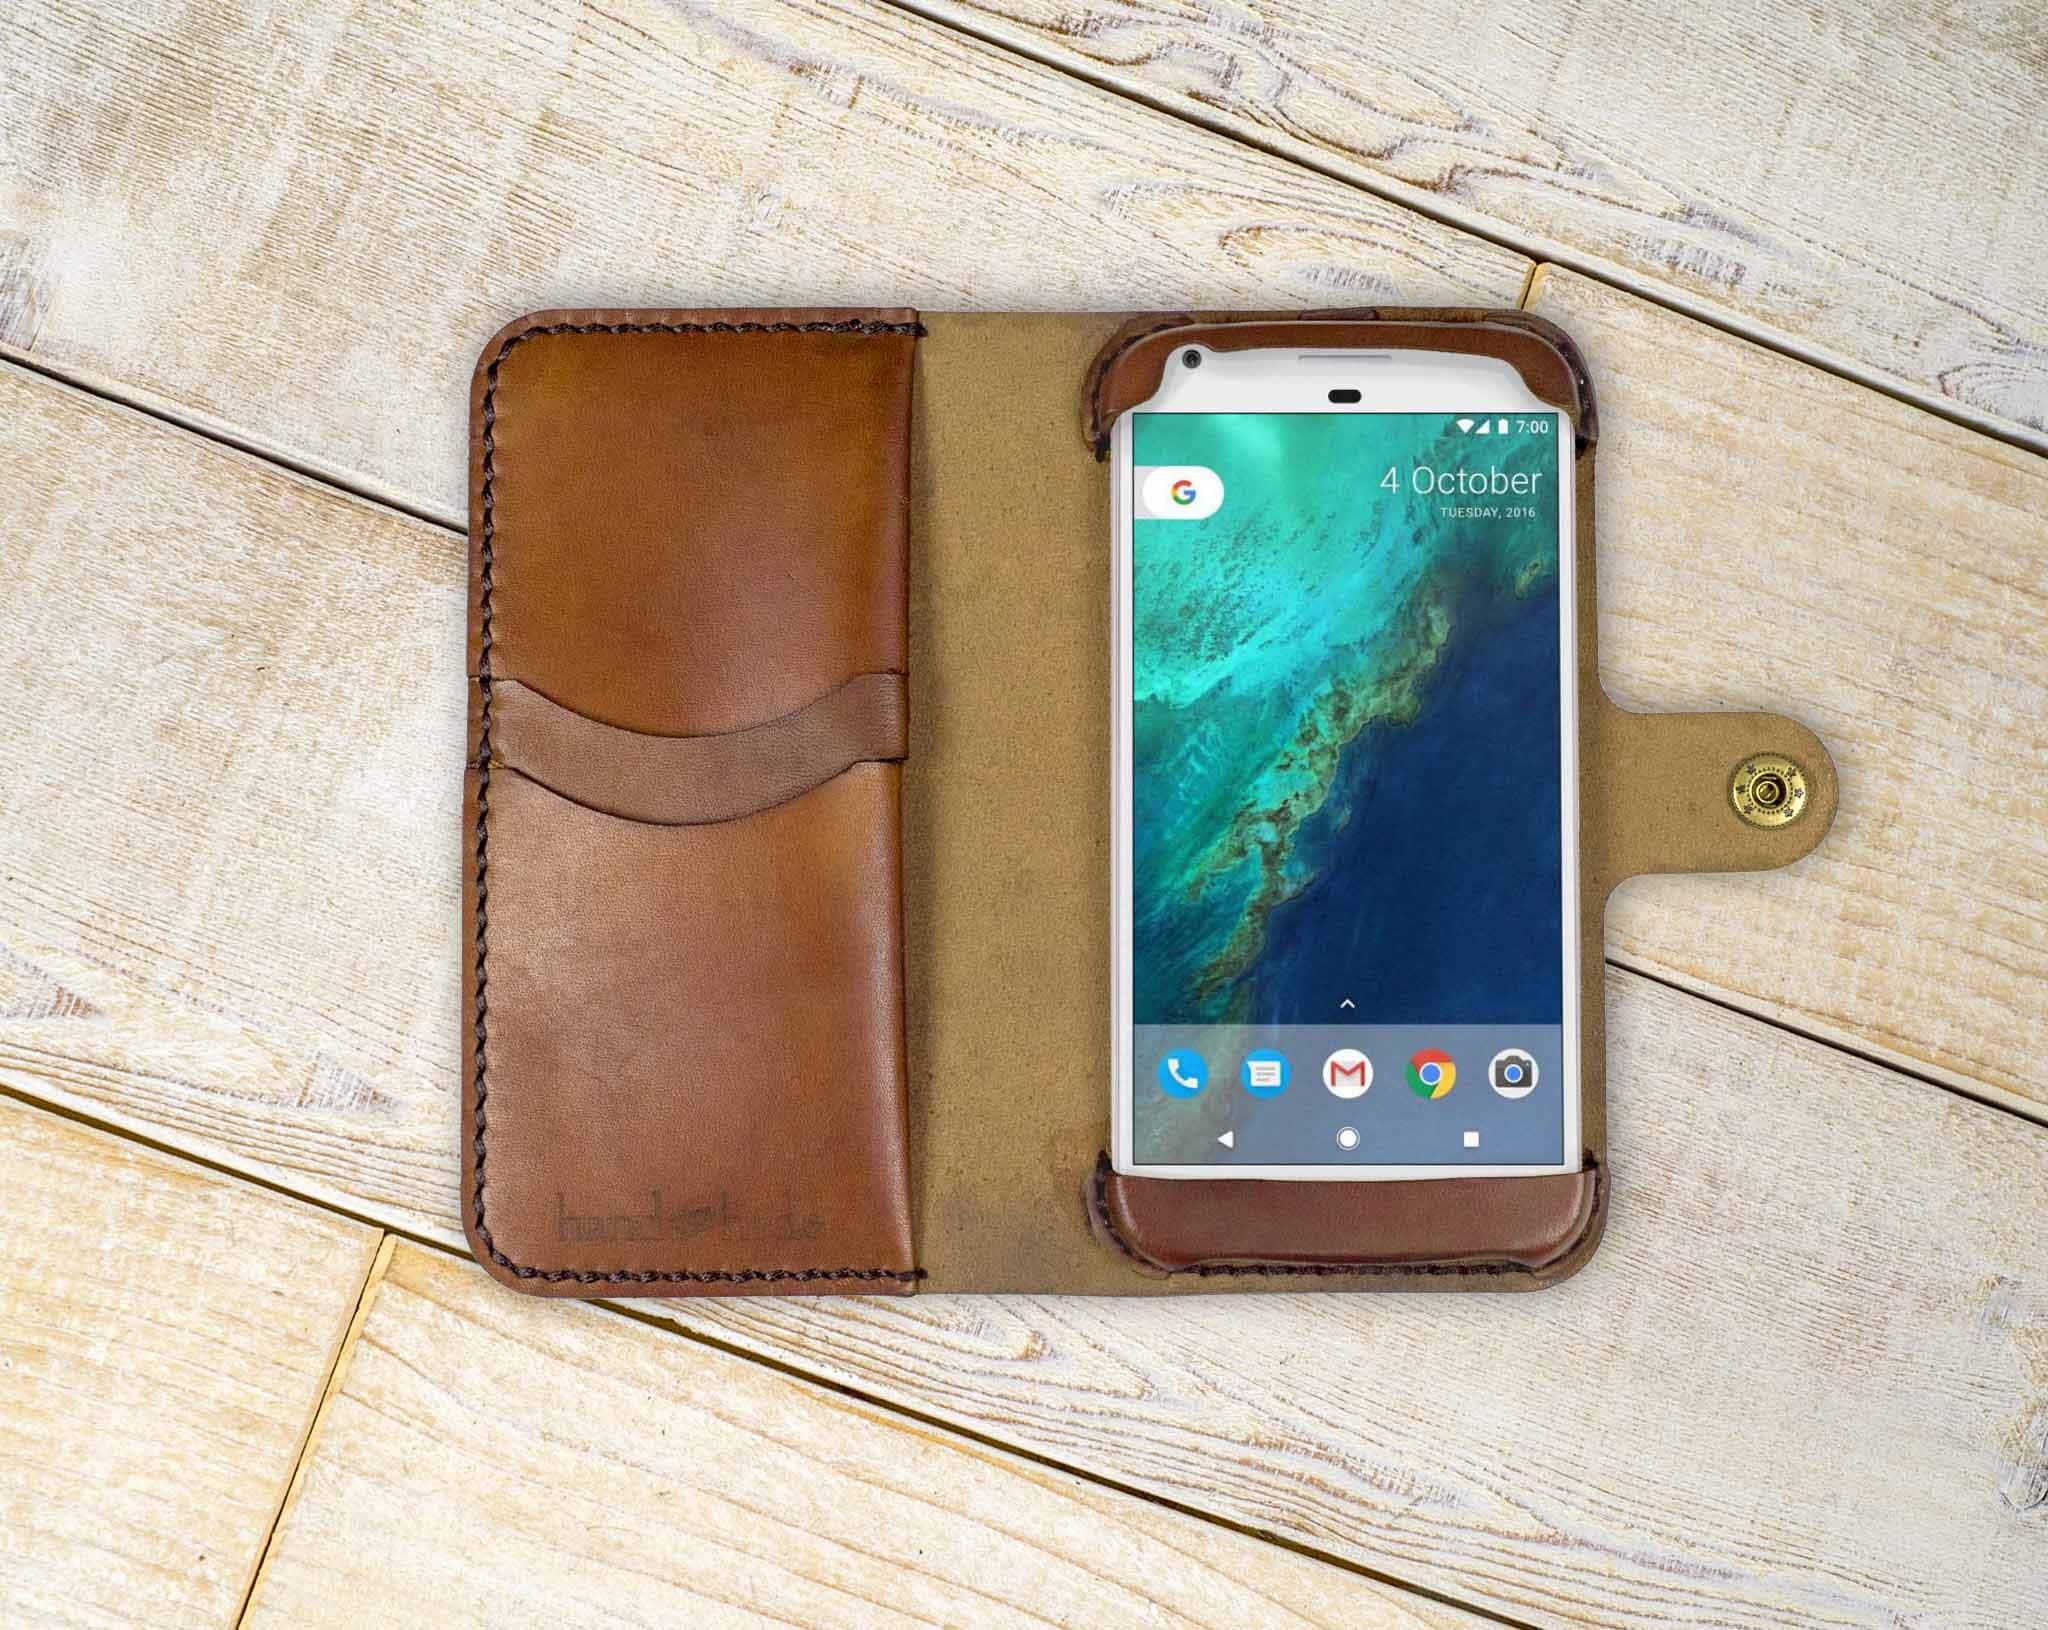 c87753babb97 Google Pixel Leather Wallet Case, Google pixel wallet, pixel case, google  pixel wristlet, pixel wallet, custom pixel case